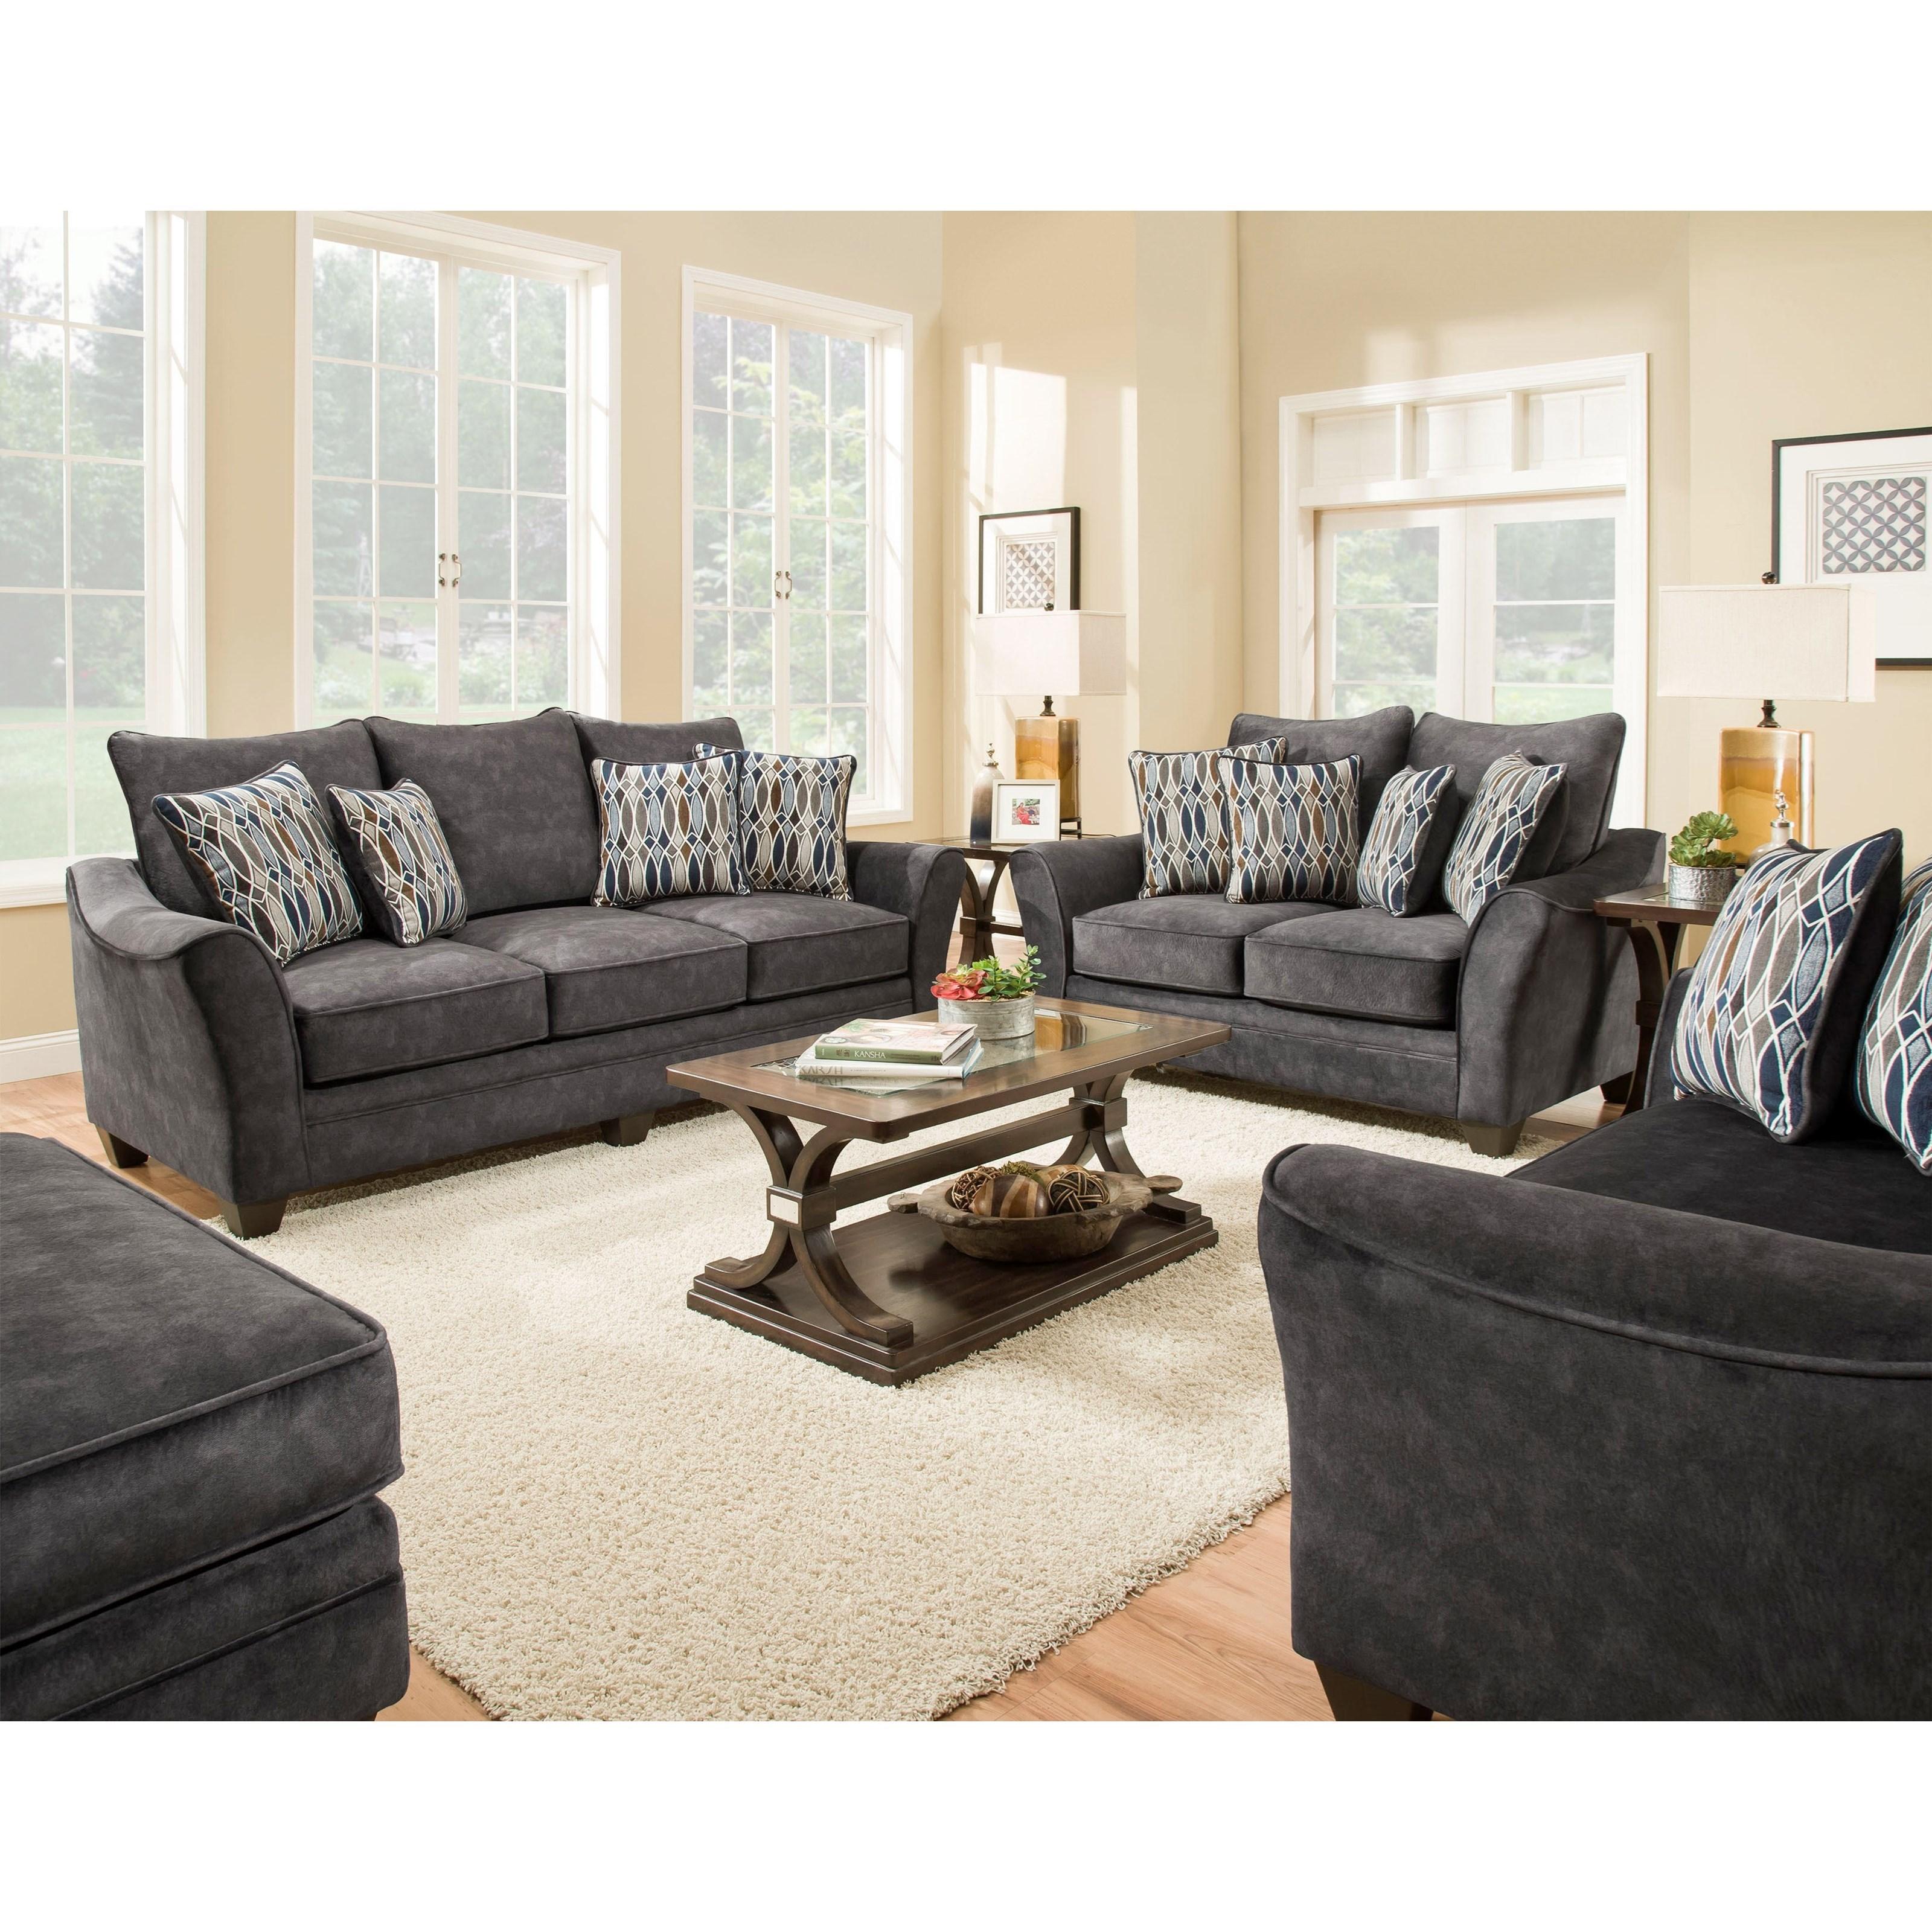 American furniture 3850 stationary living room group for Living room furniture groups